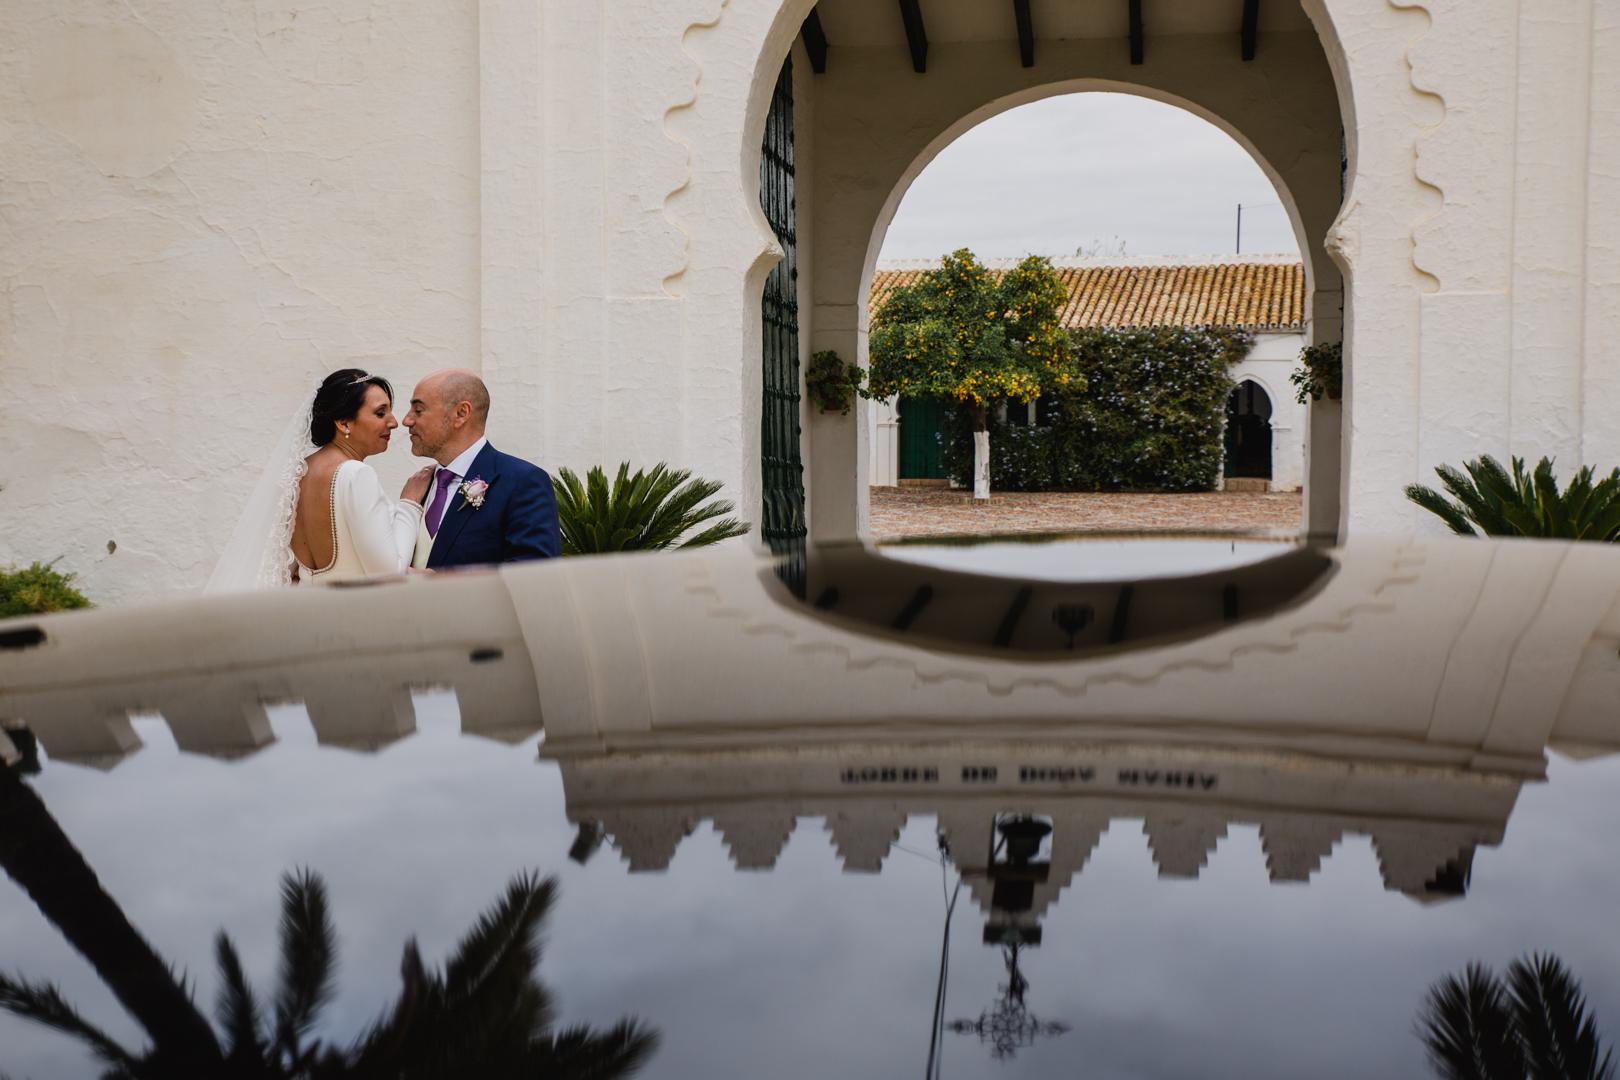 2-boda hacienda torre doña maria. carlos pavon fotografia. 600257783-11.jpg